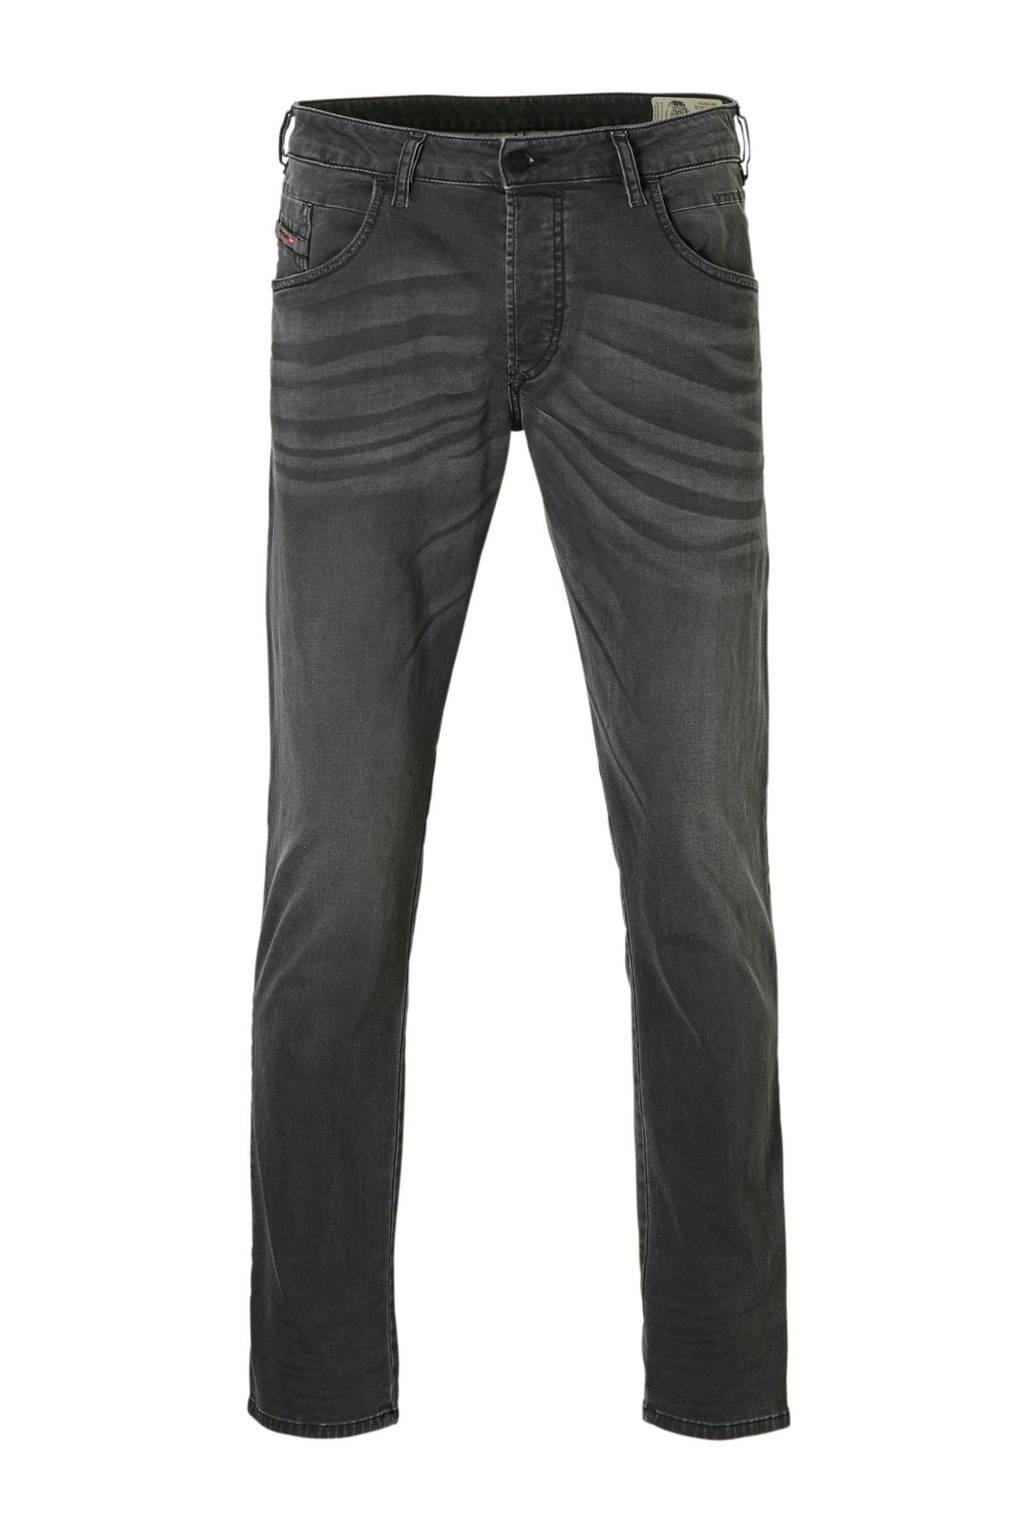 Diesel tapered fit jeans D-blazer, Grijs